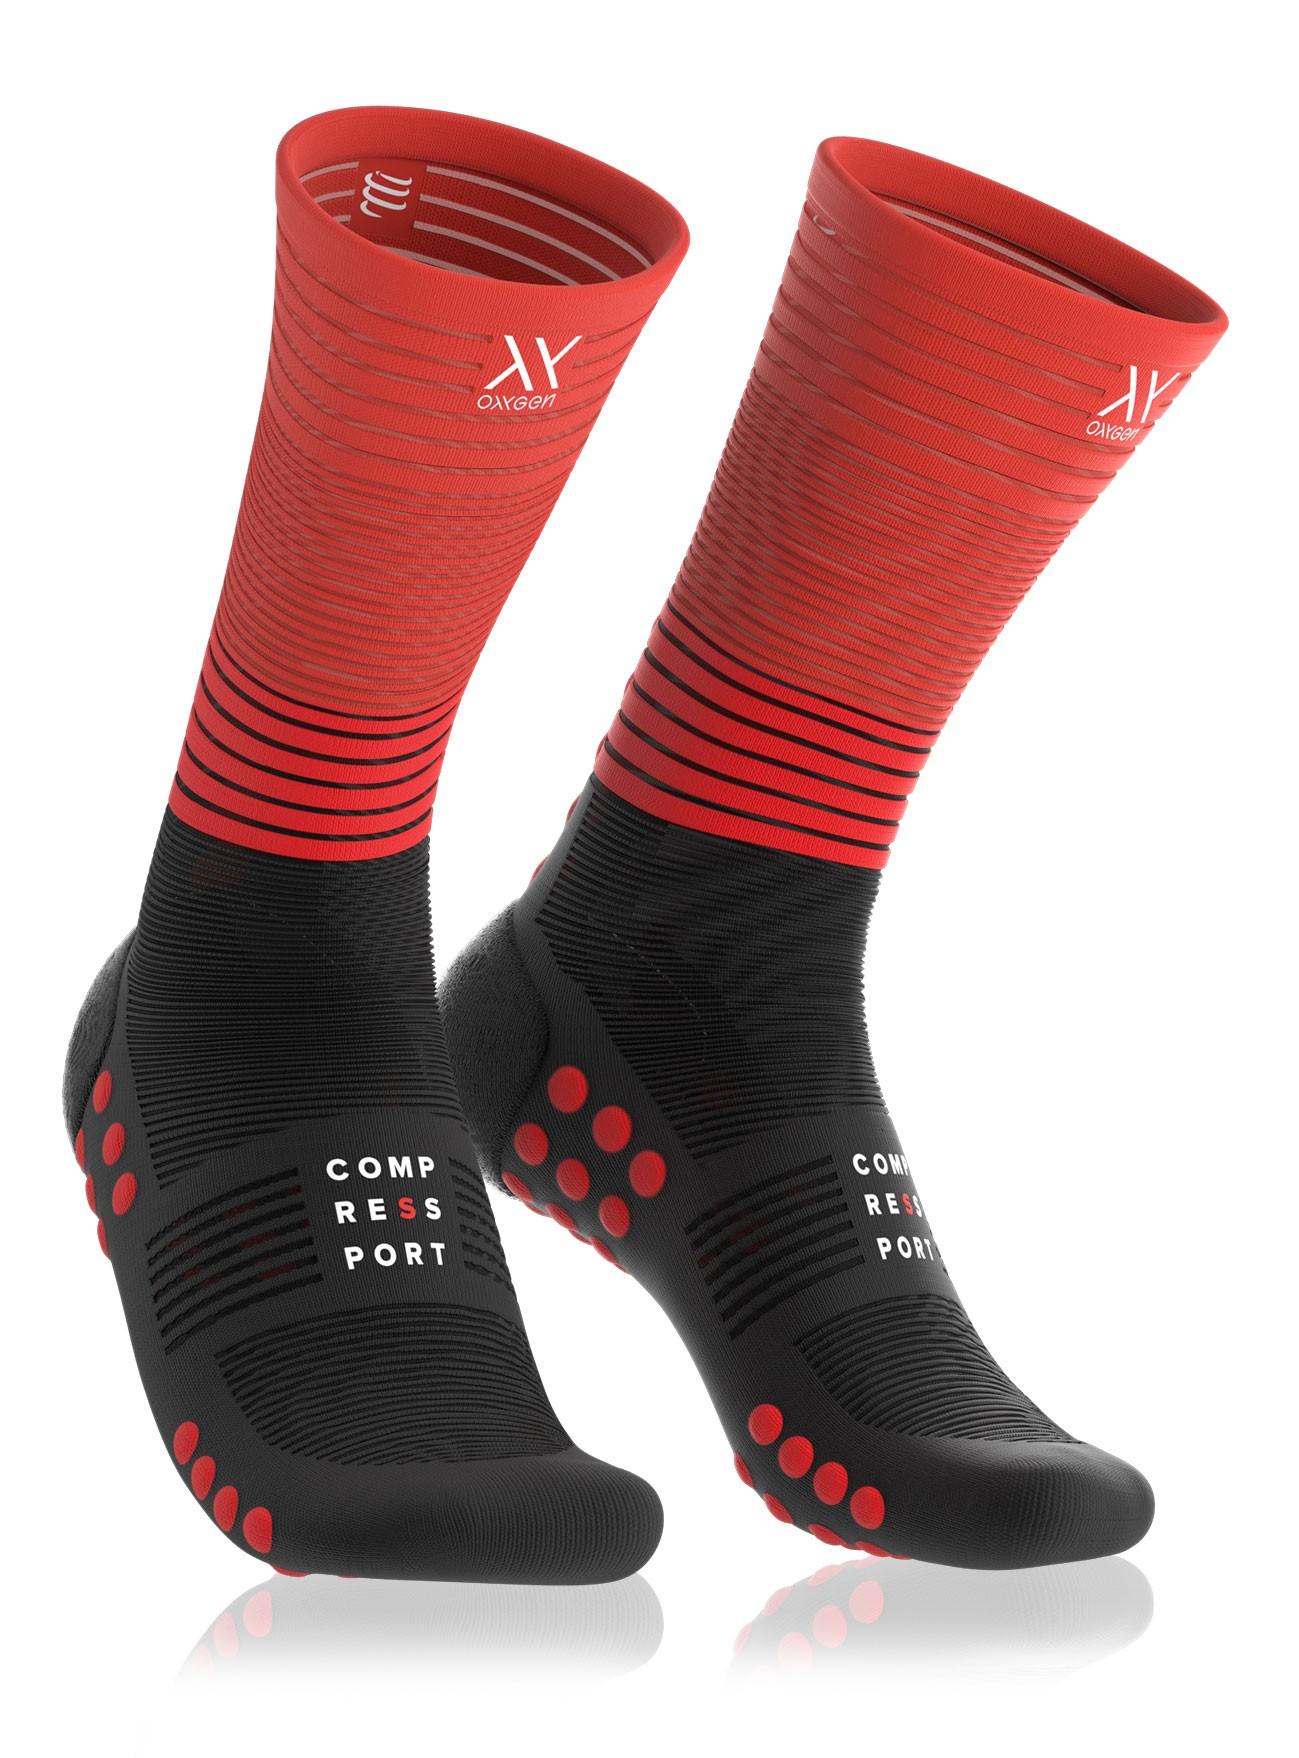 Compressport Mid Compression Socks - Compression socks